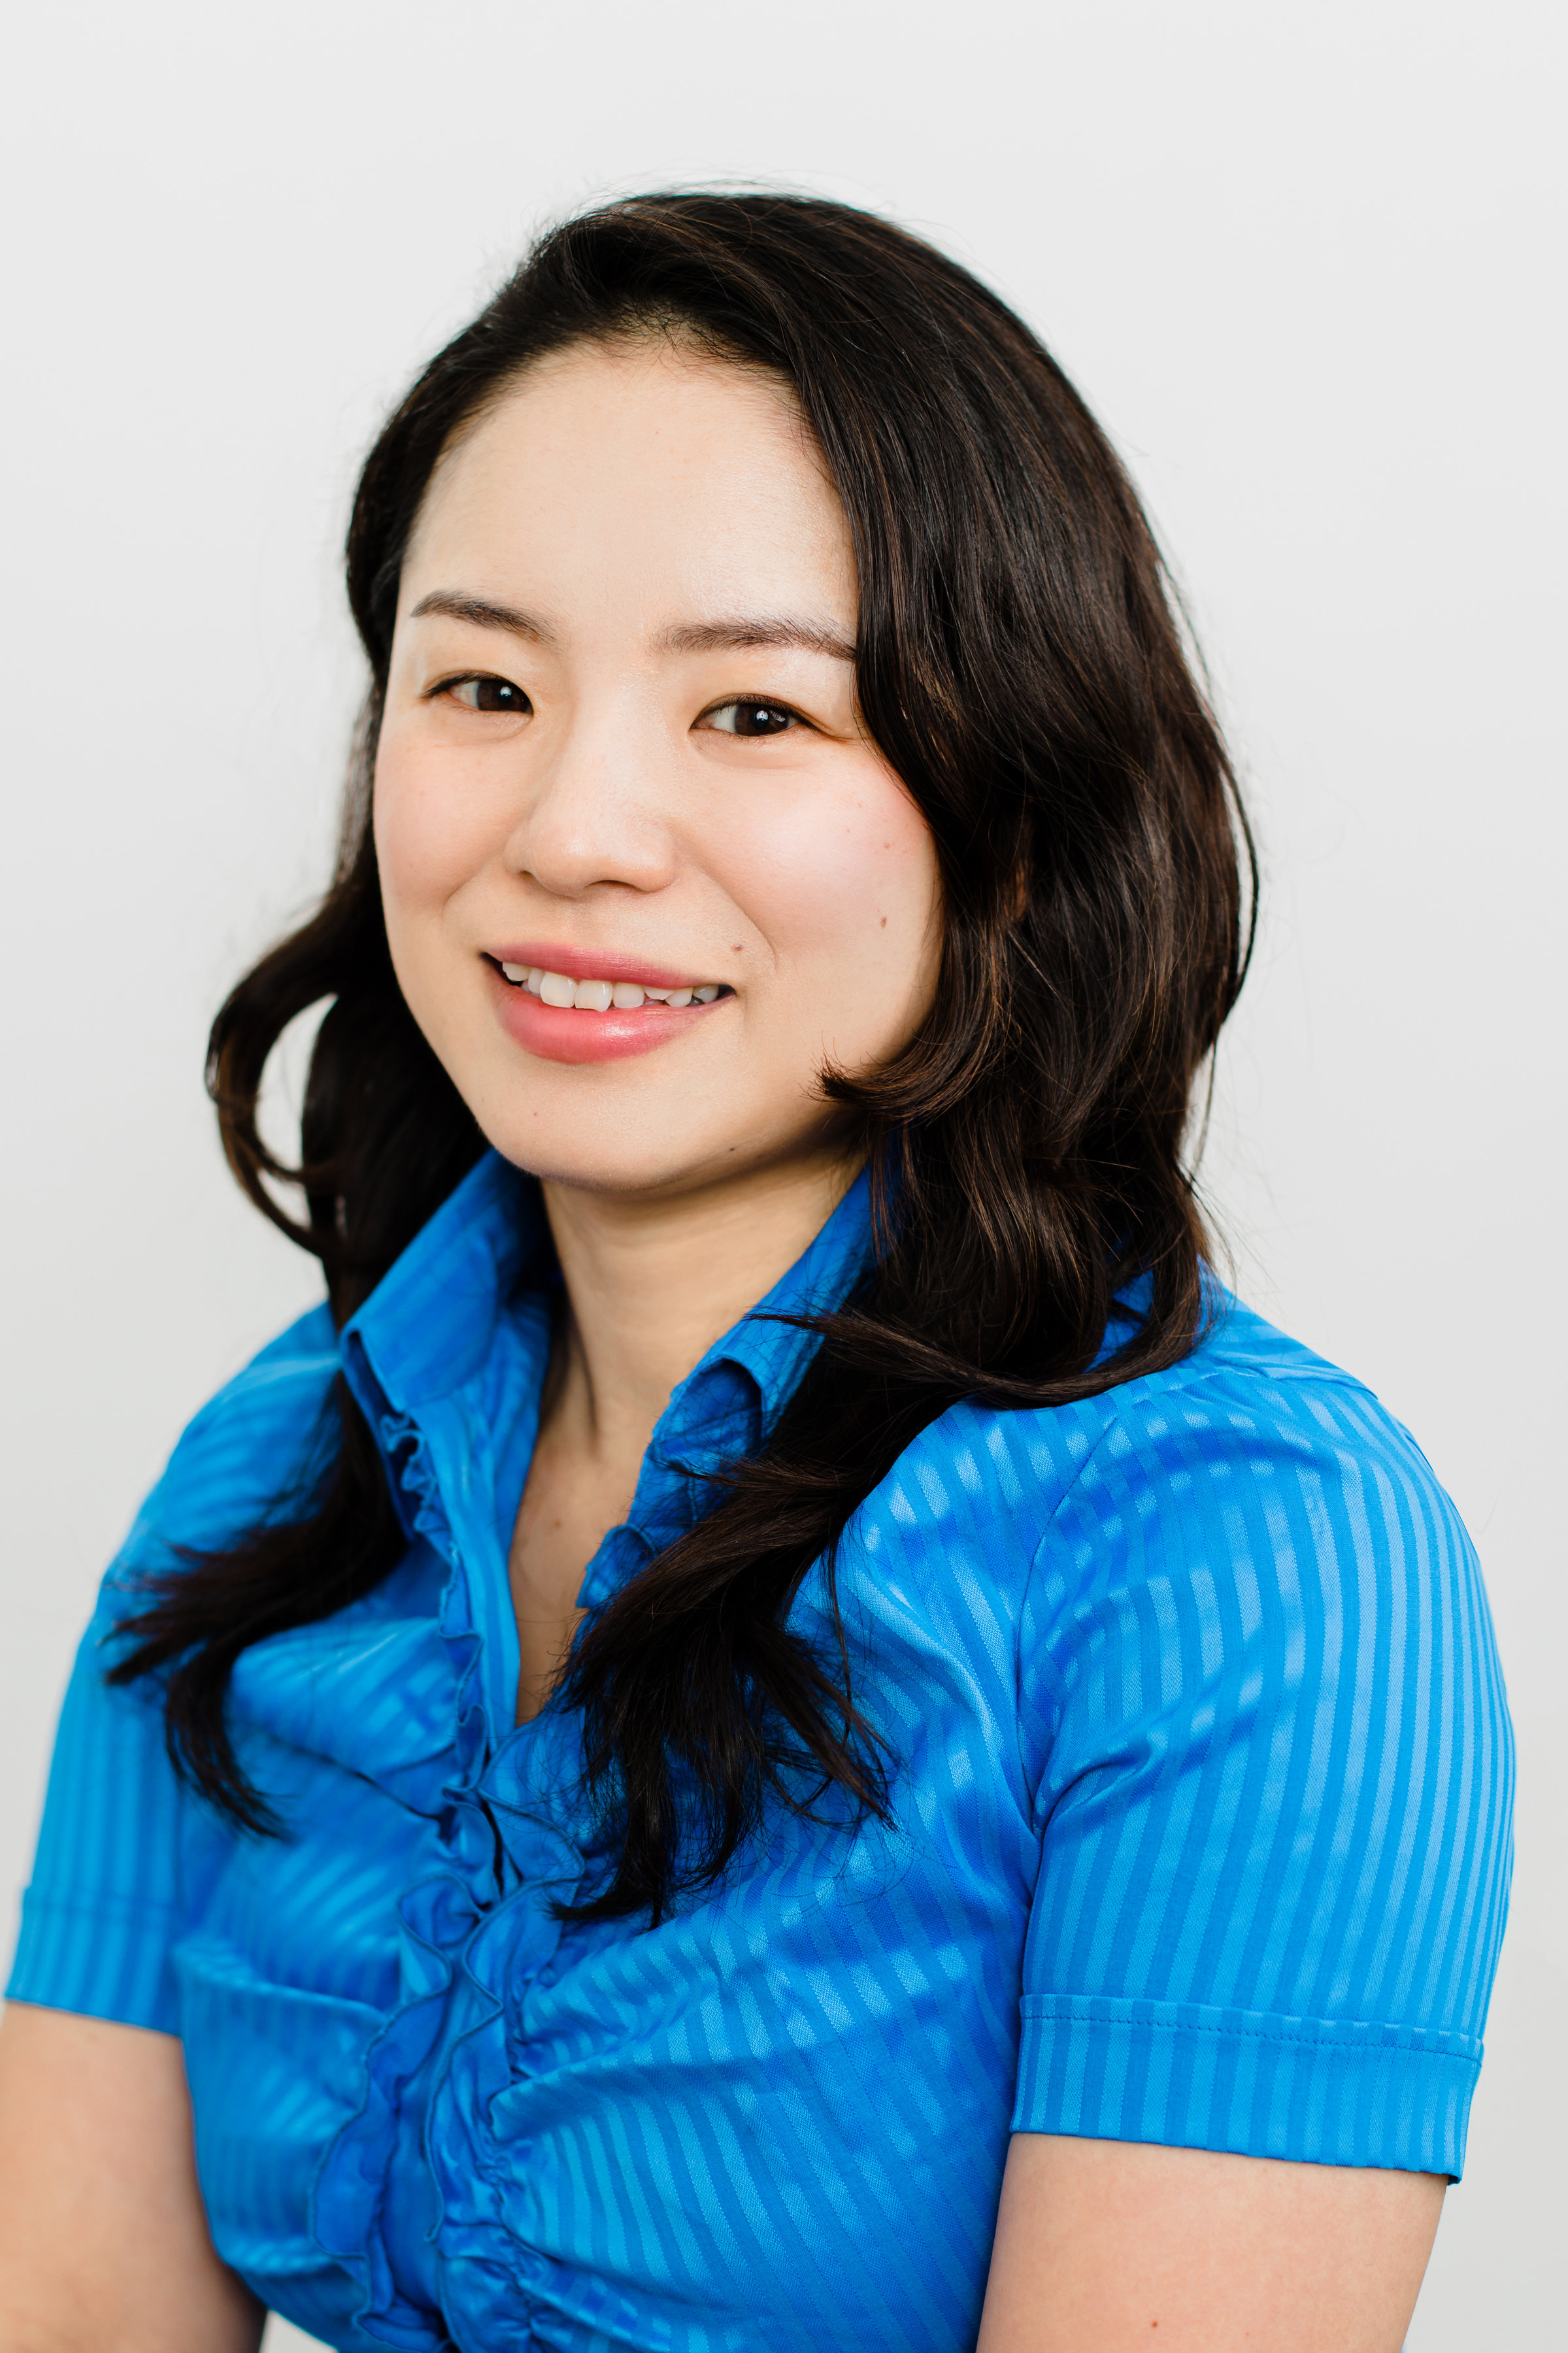 Nori Kawazu Global Business Development Director Headshot